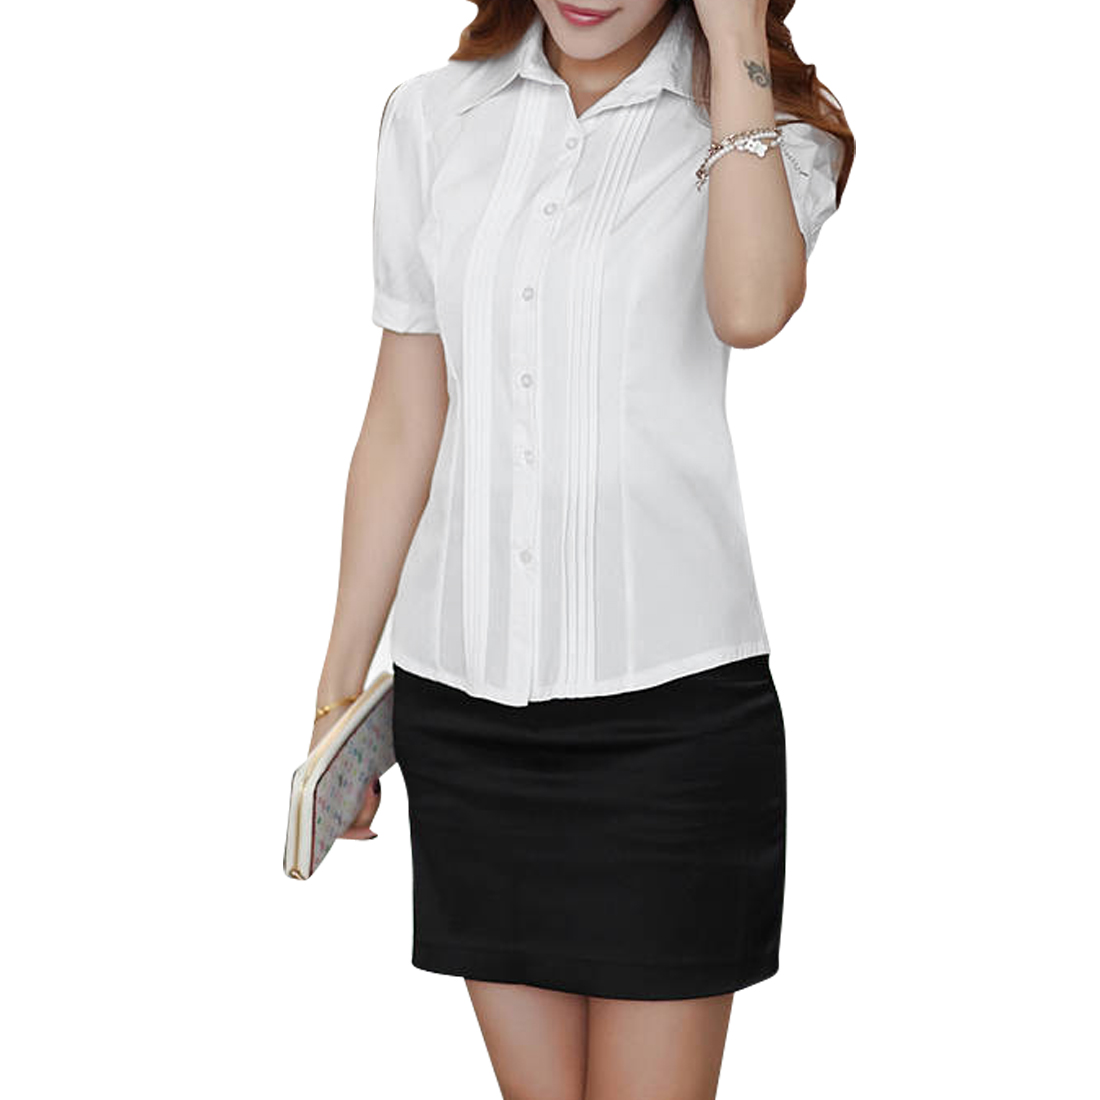 Women Point Collar Round Hem Short Sleeve Design Casual Top Shirt M White